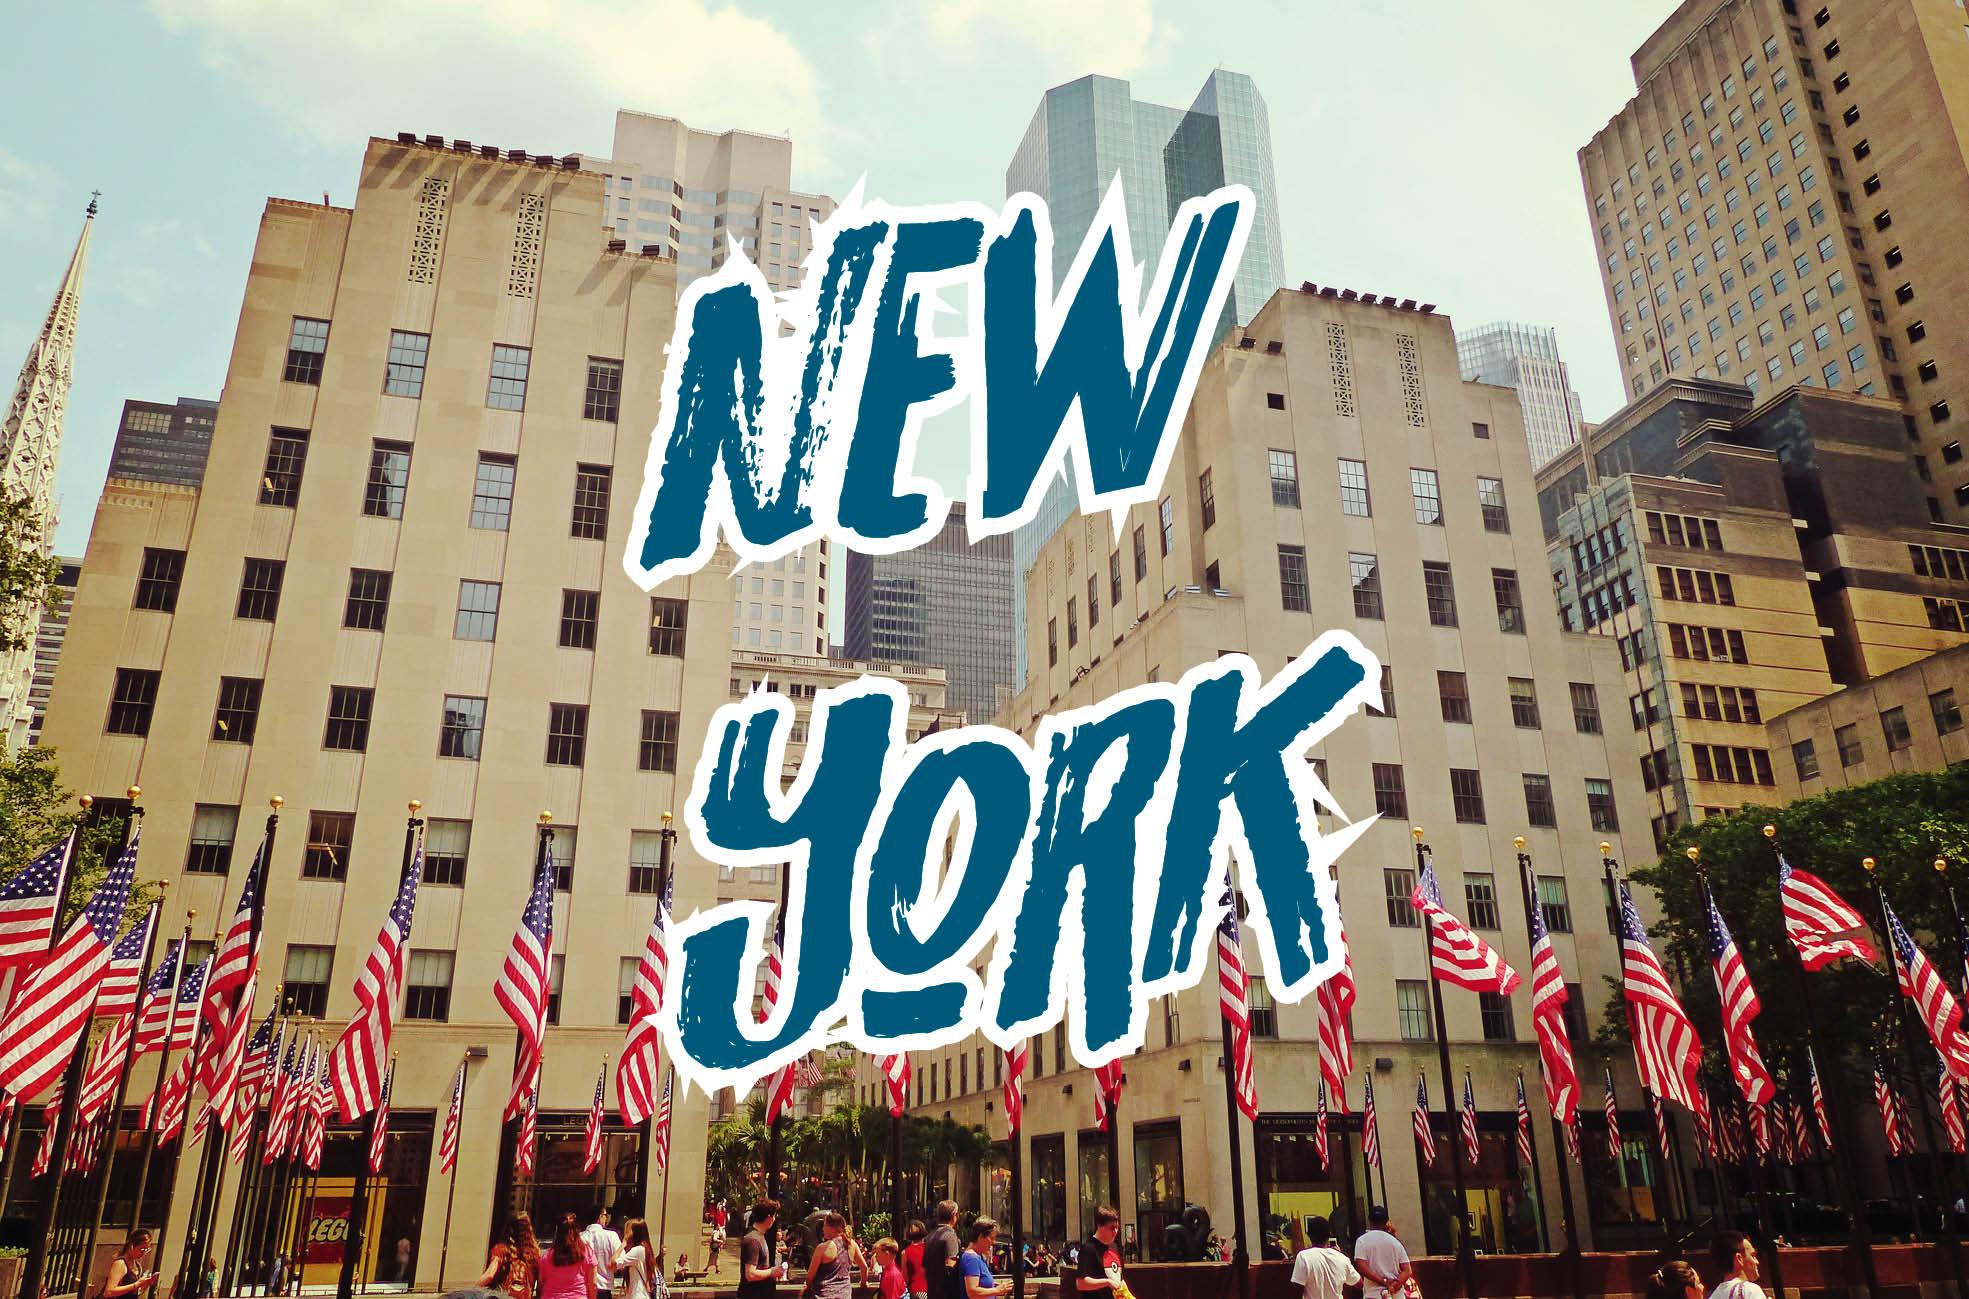 NYC, new-york, Manhattan, usa, road trip, voyage, etats unis, amérique